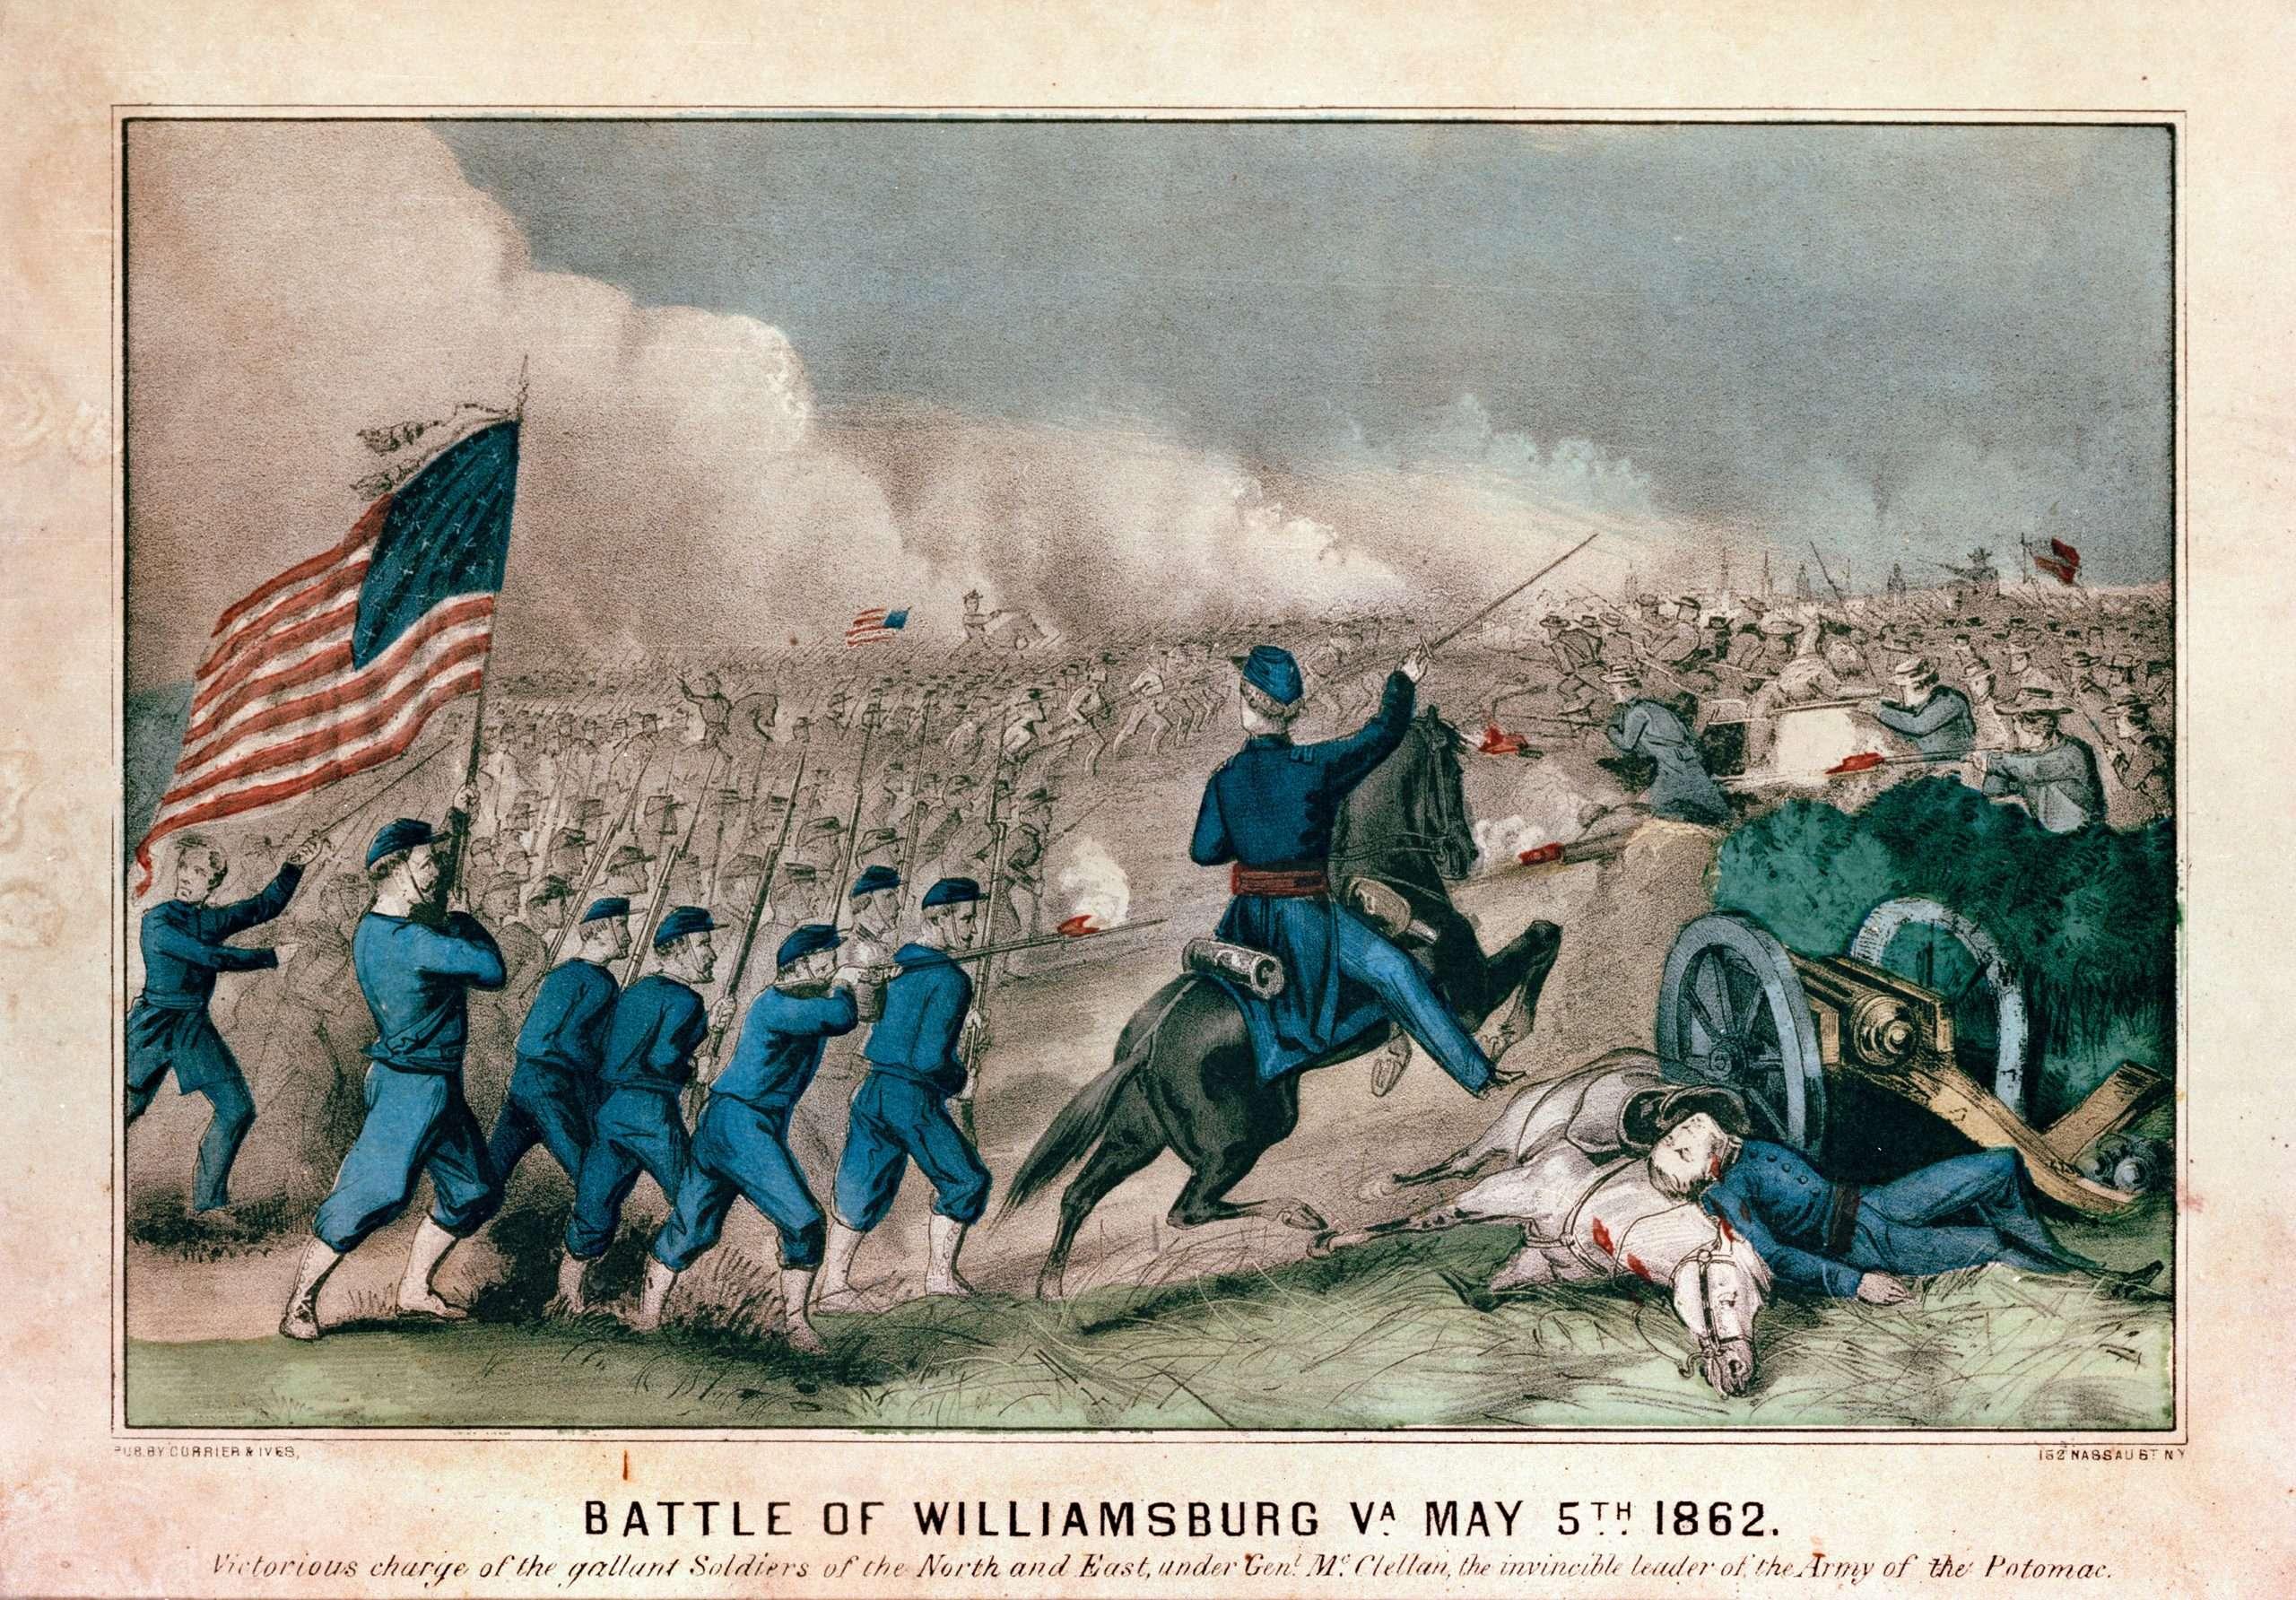 Battle of Williamsburg Va. May 5th 1862.